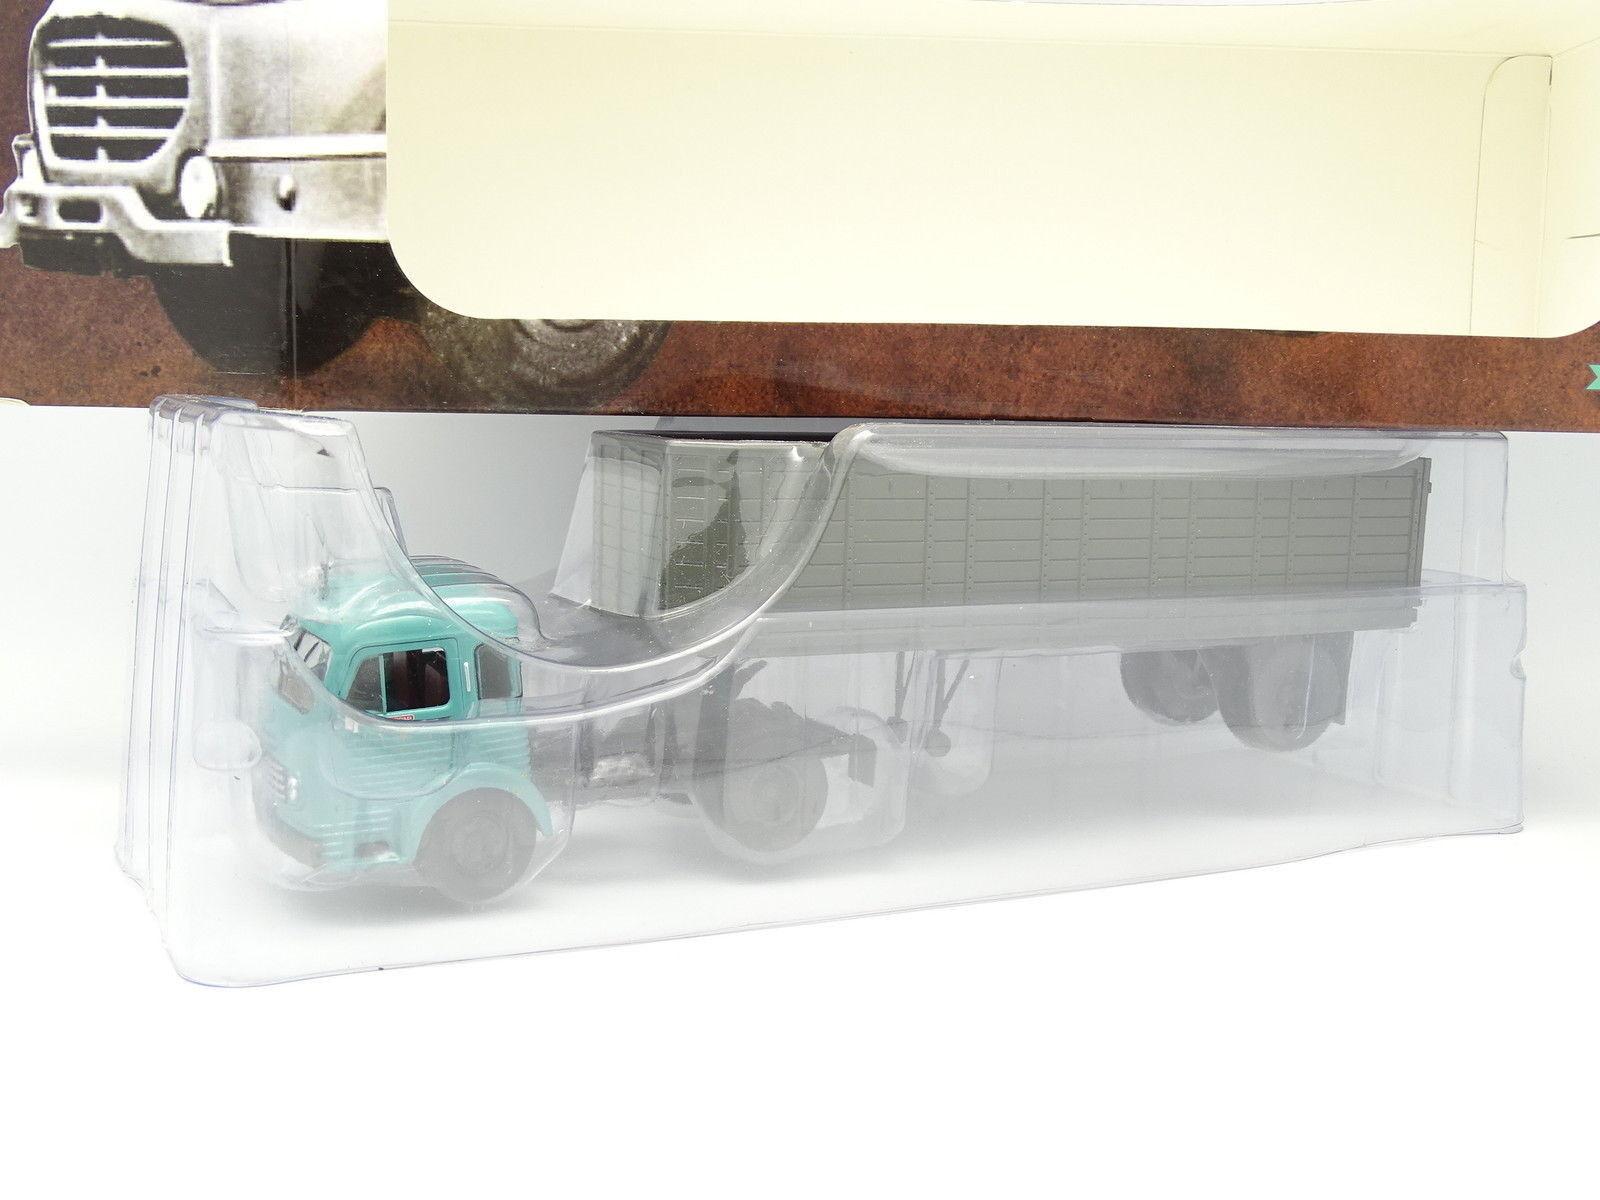 Ixo Camión de antaño 1 43 - Ford Cochego Remolcador (1951-1954)